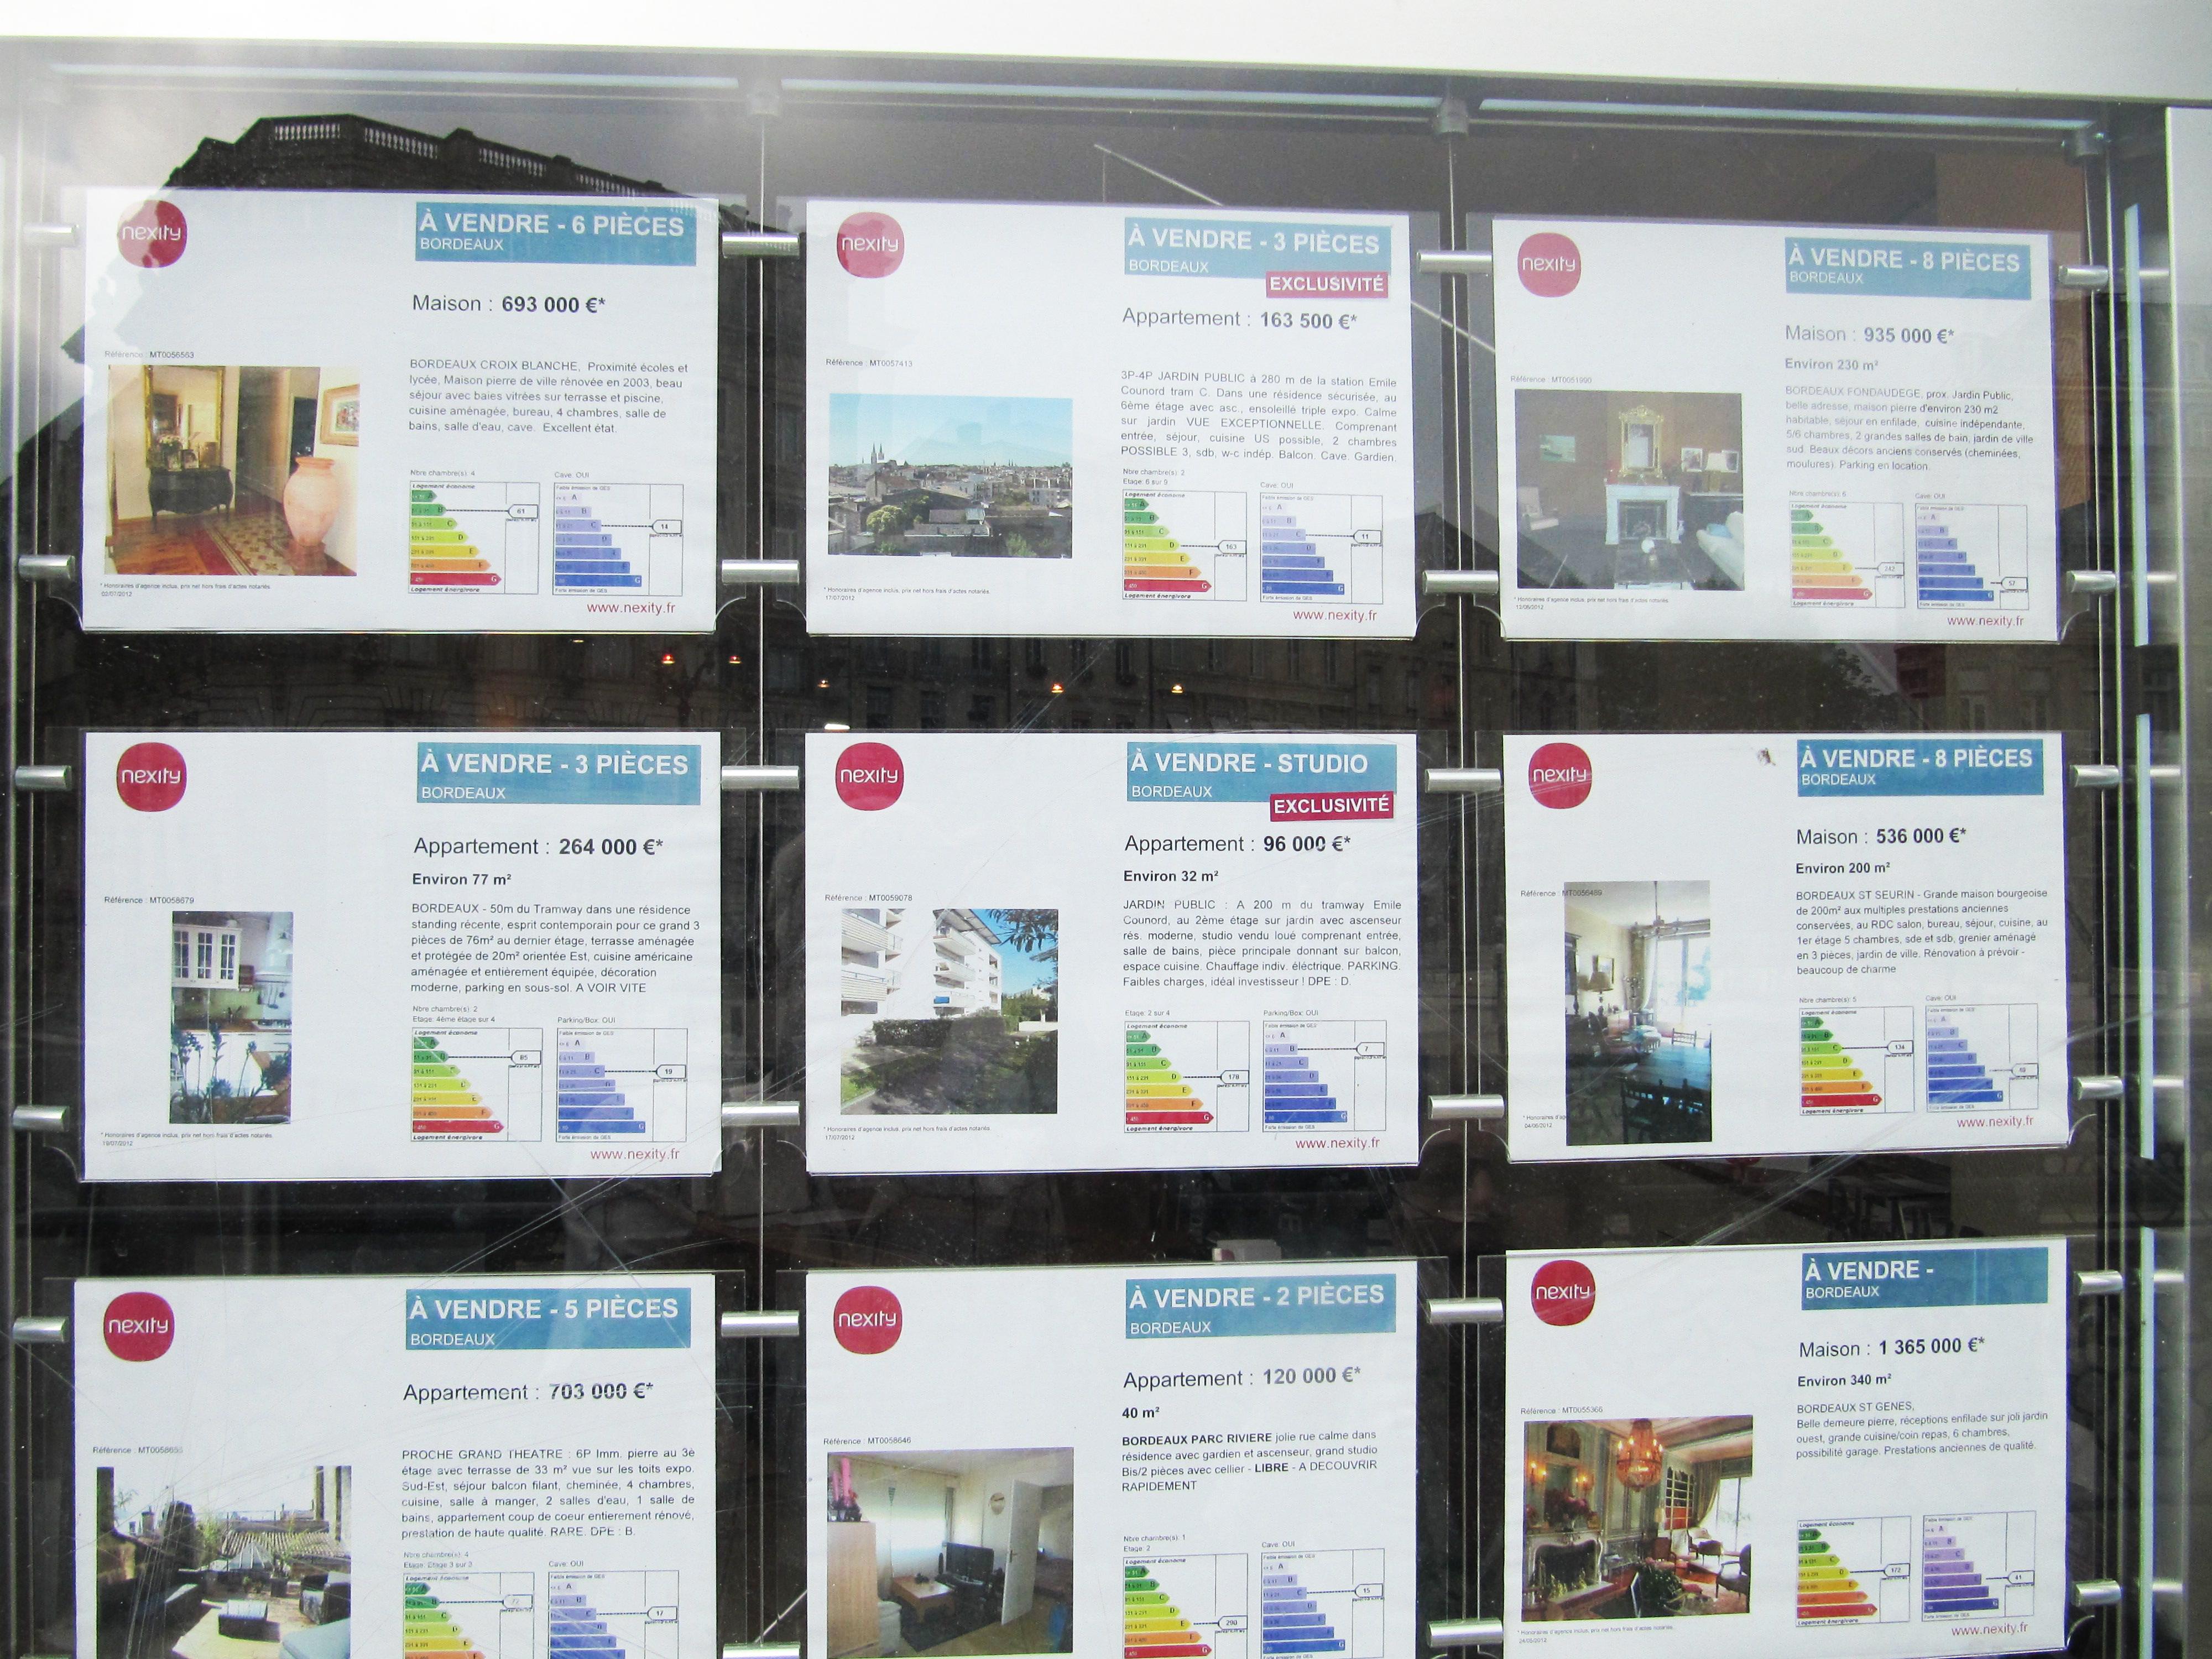 etiqueta energética en inmobiliaria en francia